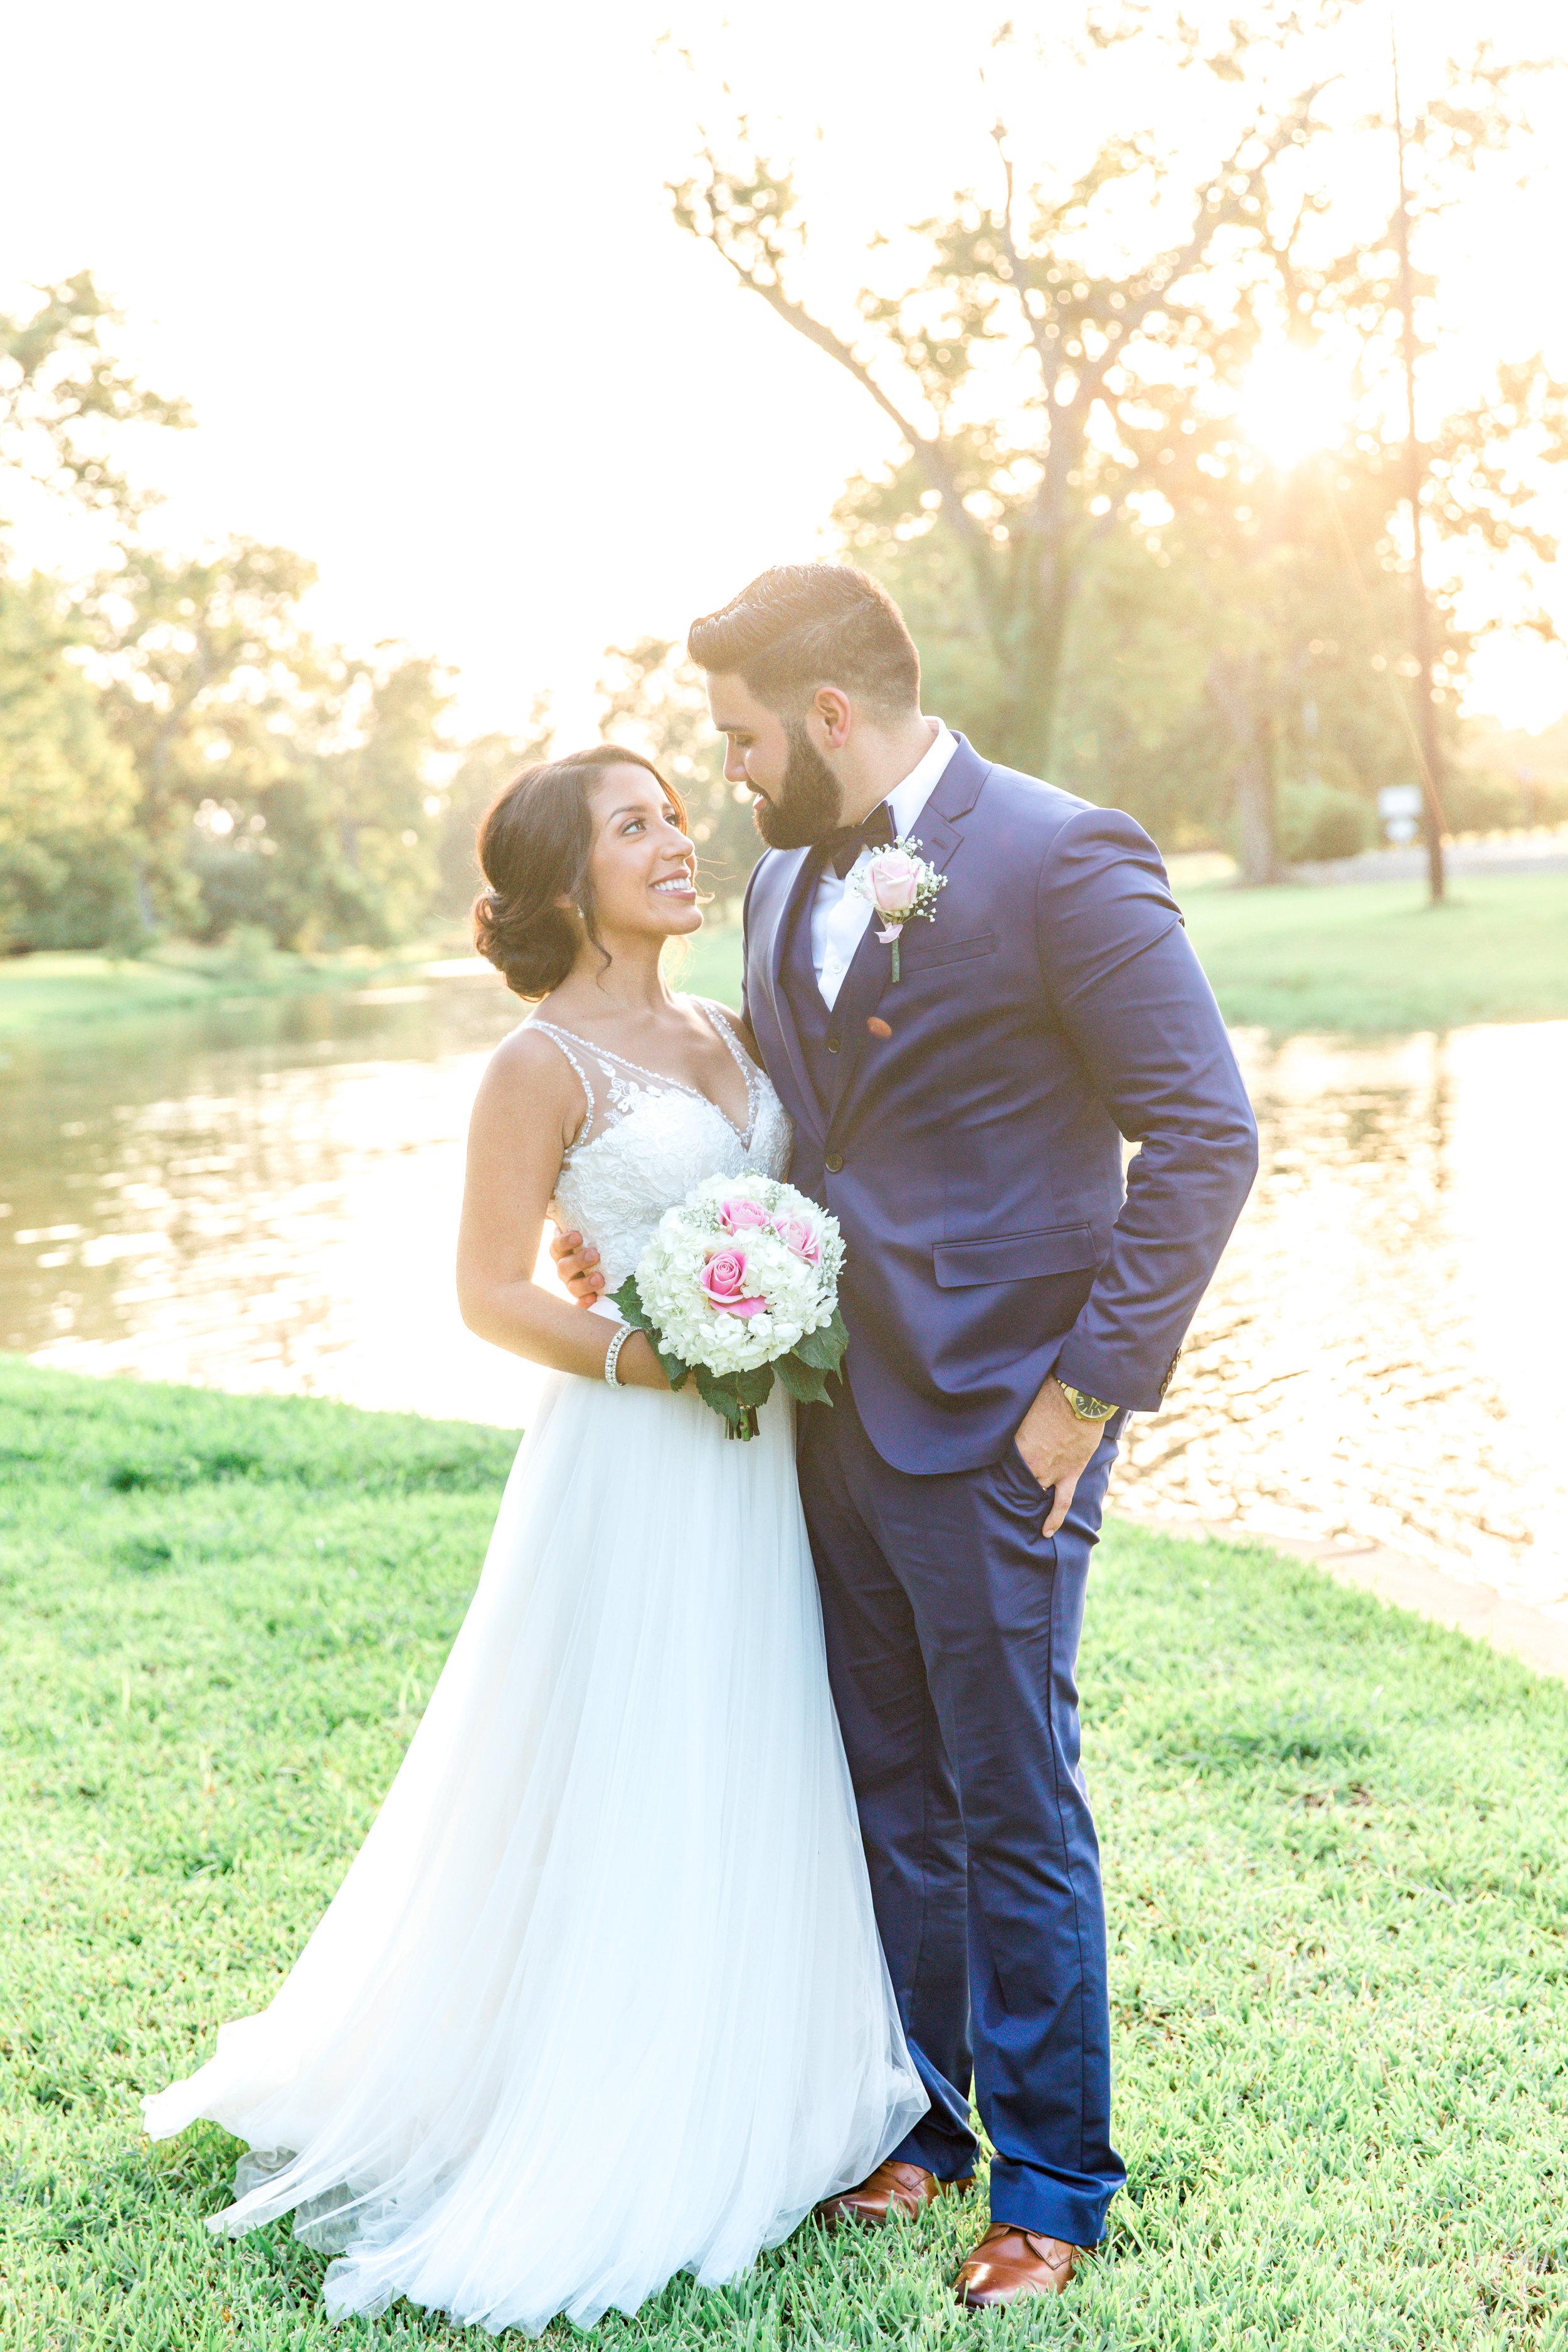 20170805-Wedding-Caro-and-Sergio-413.jpg